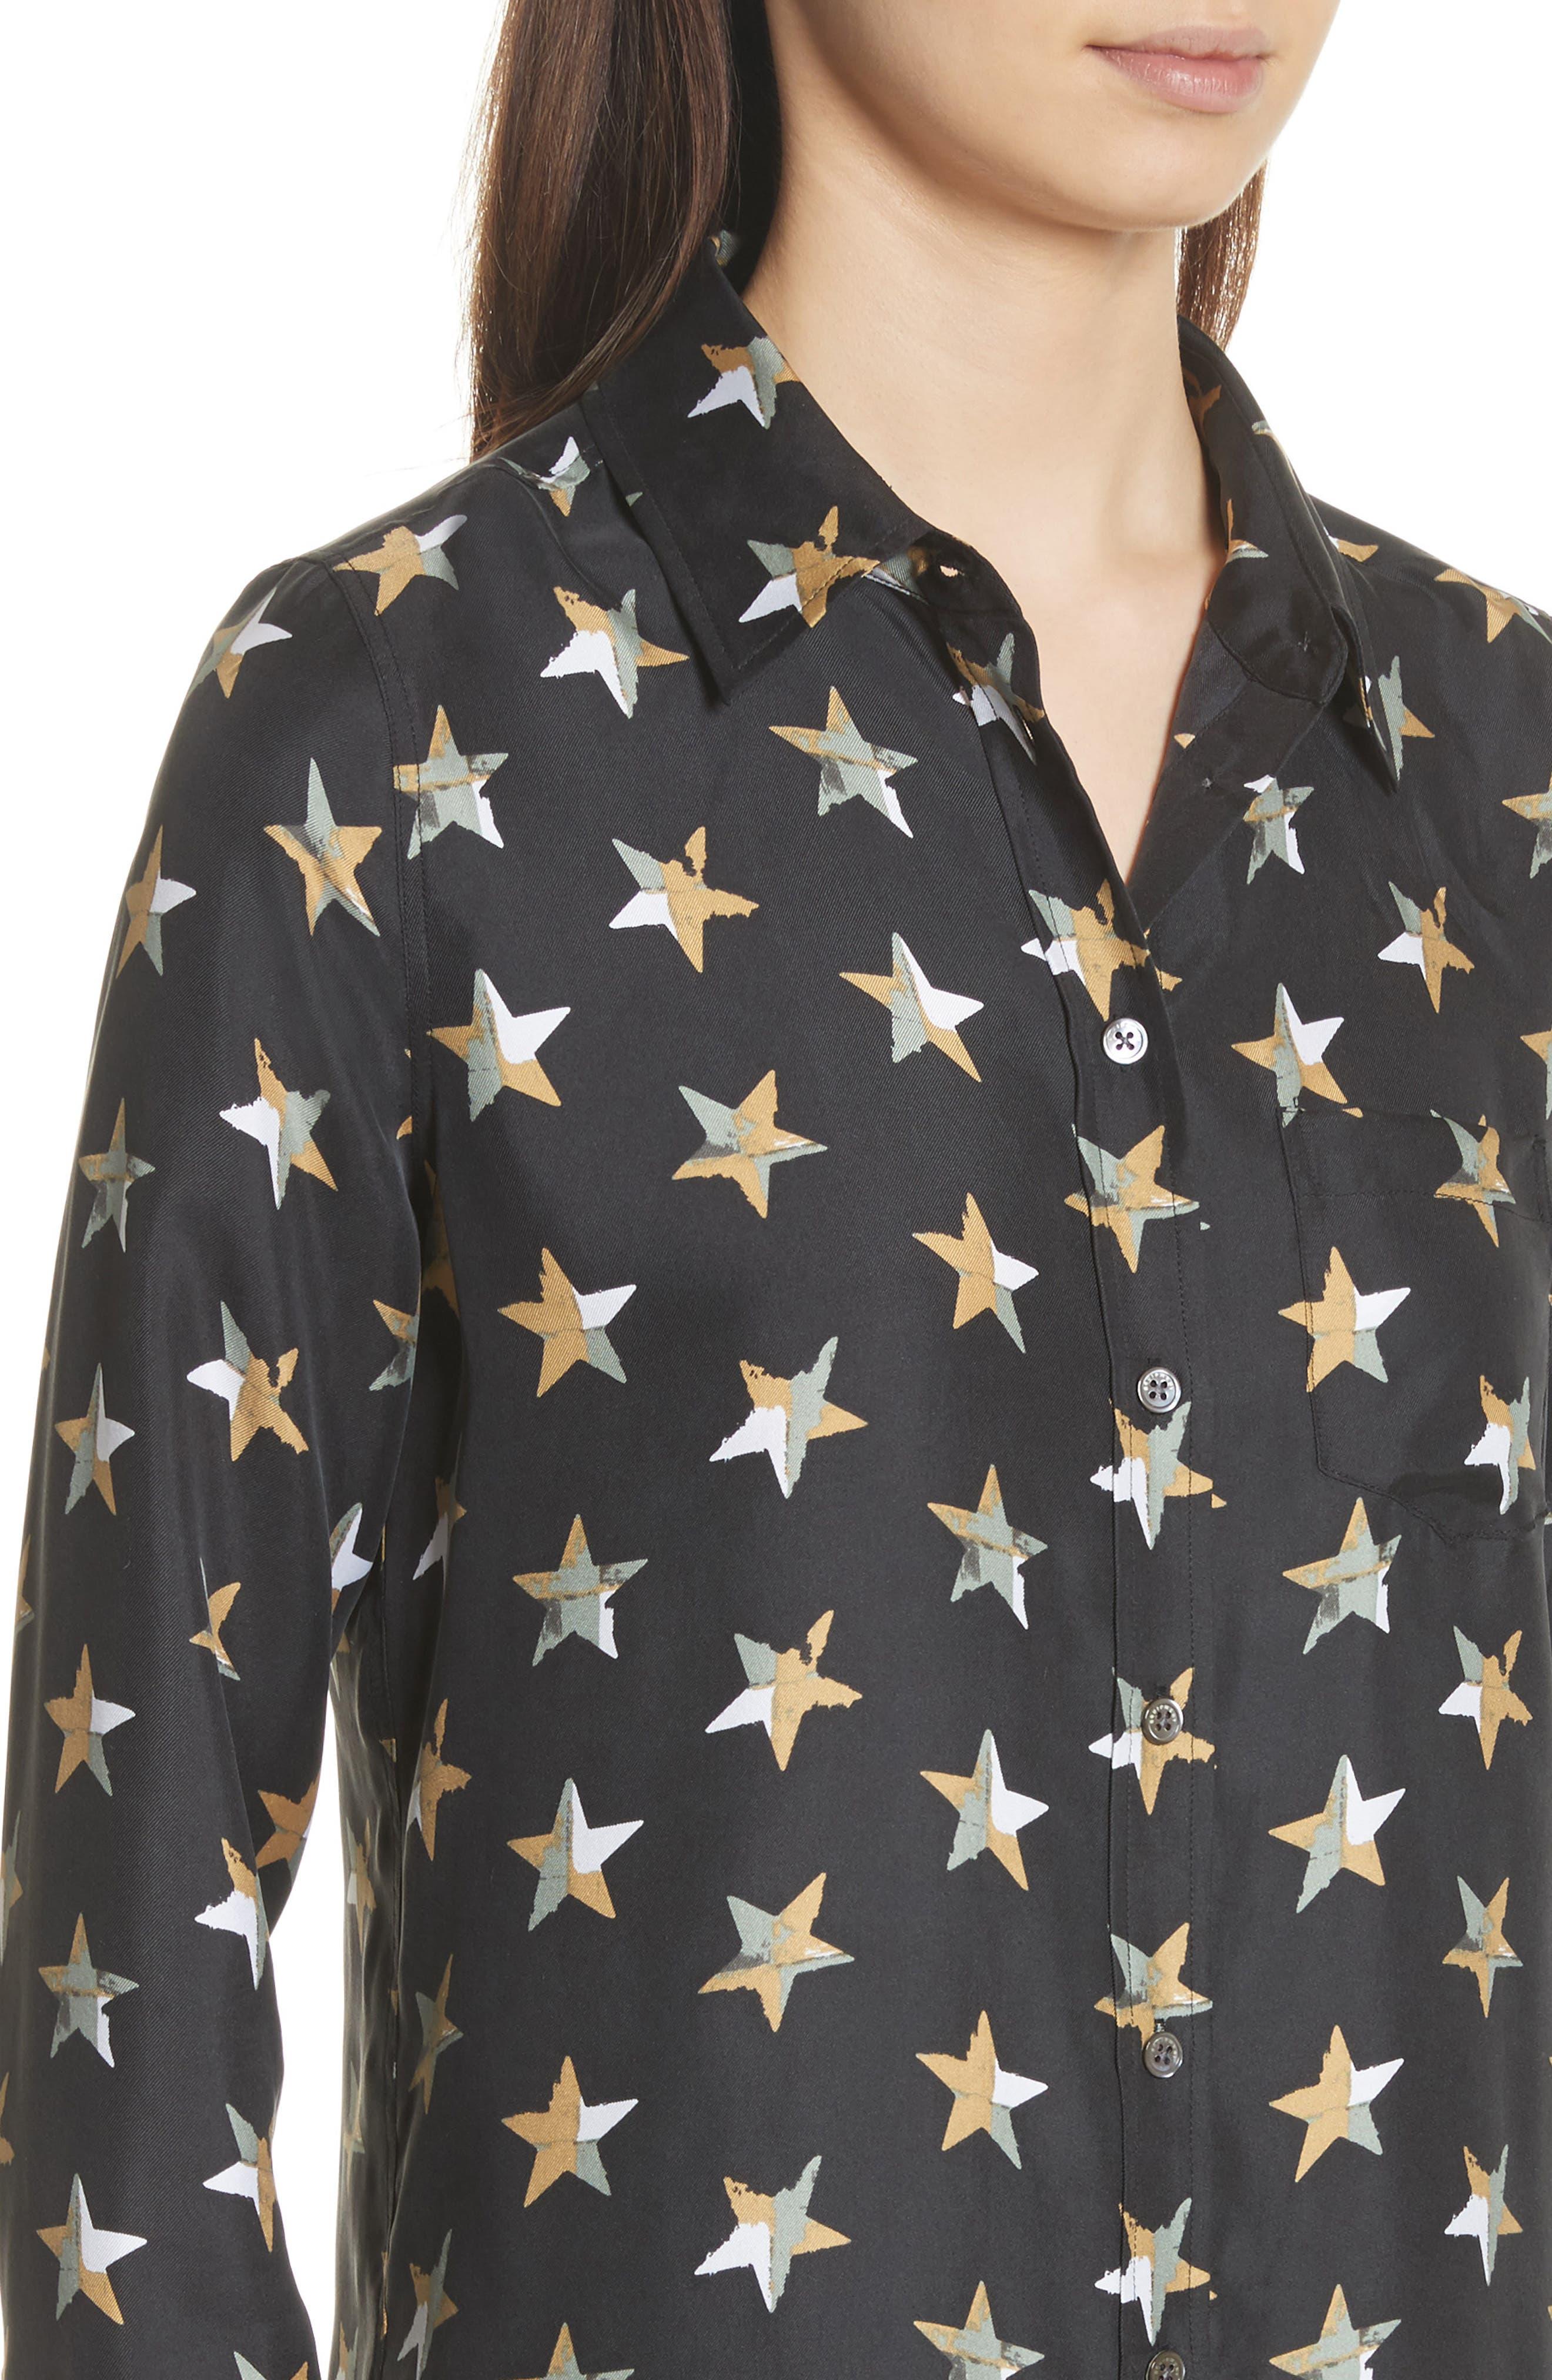 Brett Star Print Silk Shirtdress,                             Alternate thumbnail 4, color,                             006